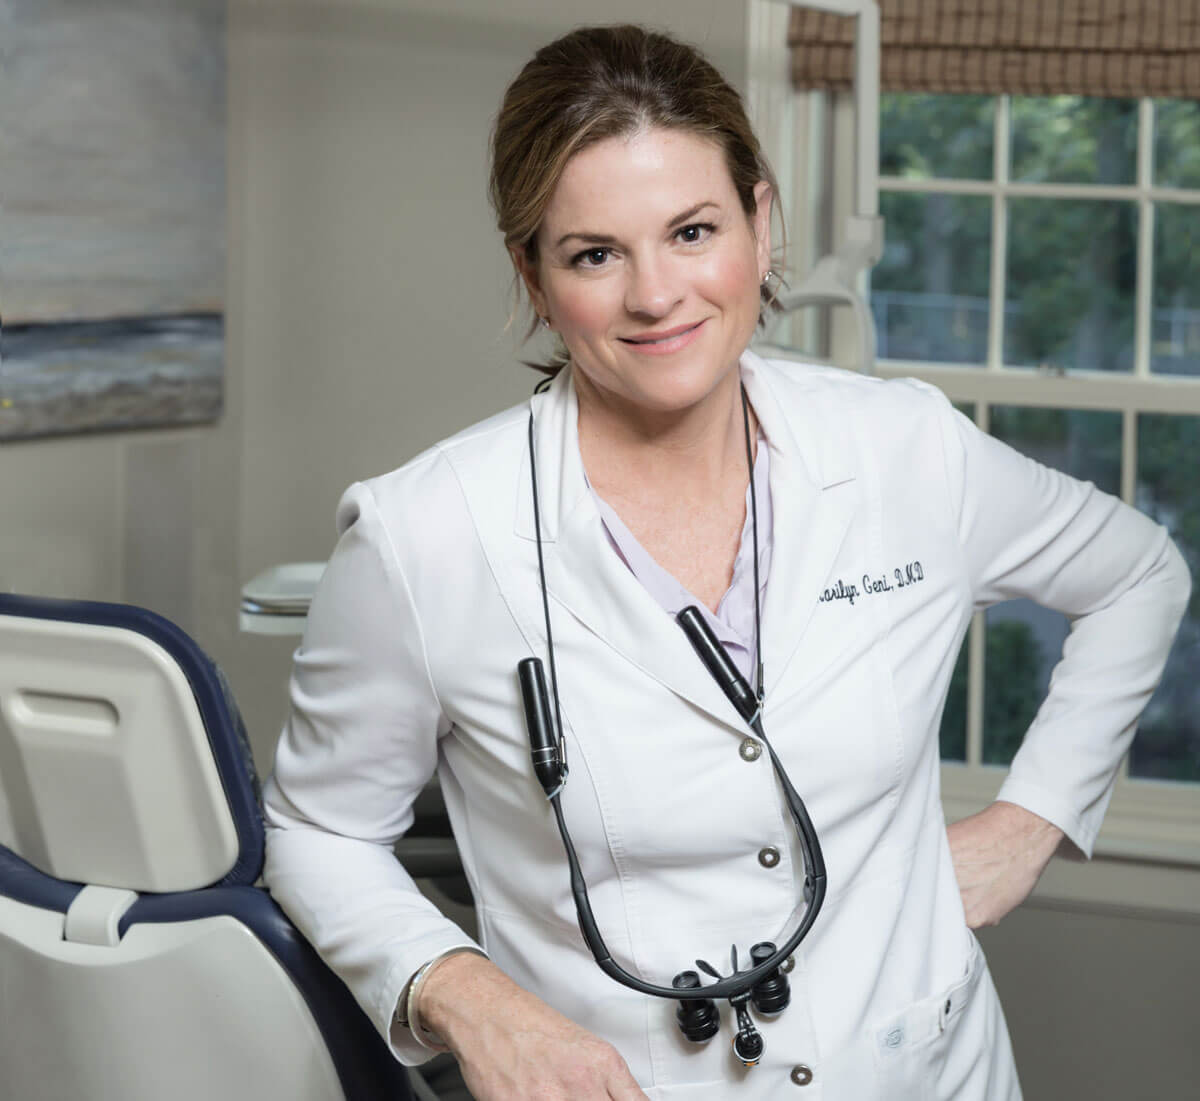 Meet Dr. Marilyn Geni & Dr. Pamela Gibson